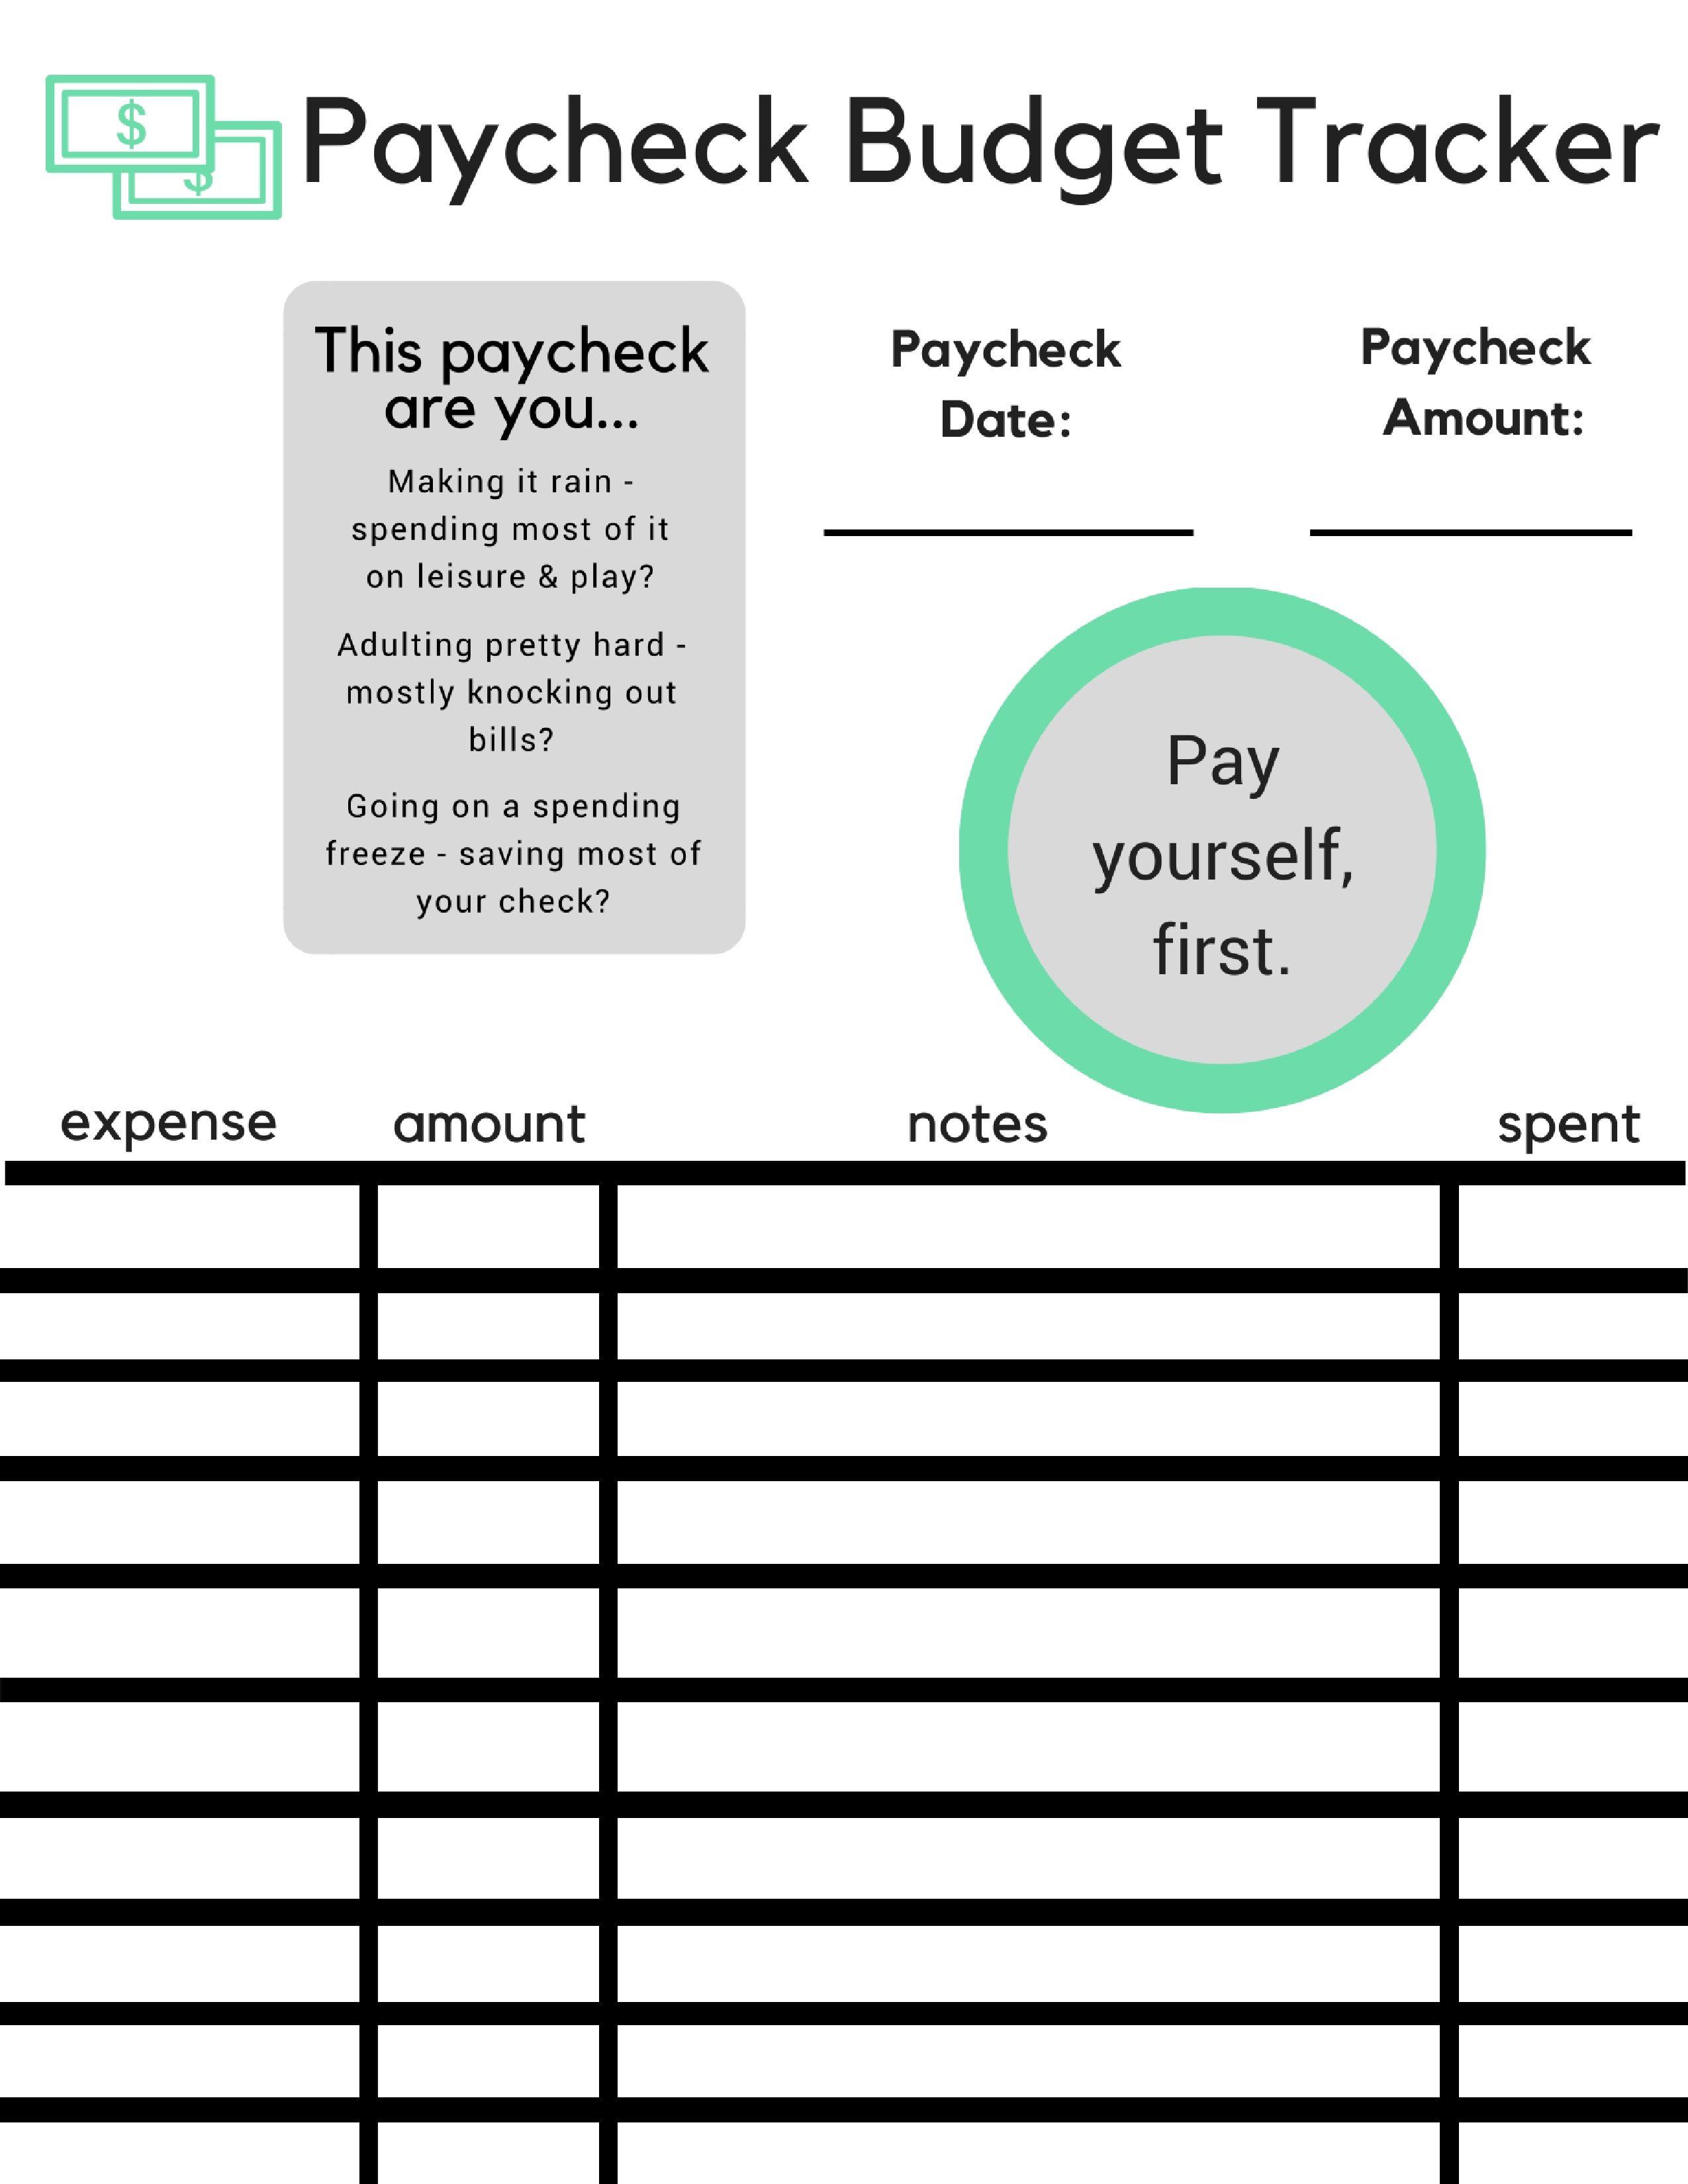 Paycheck Budget Tracker